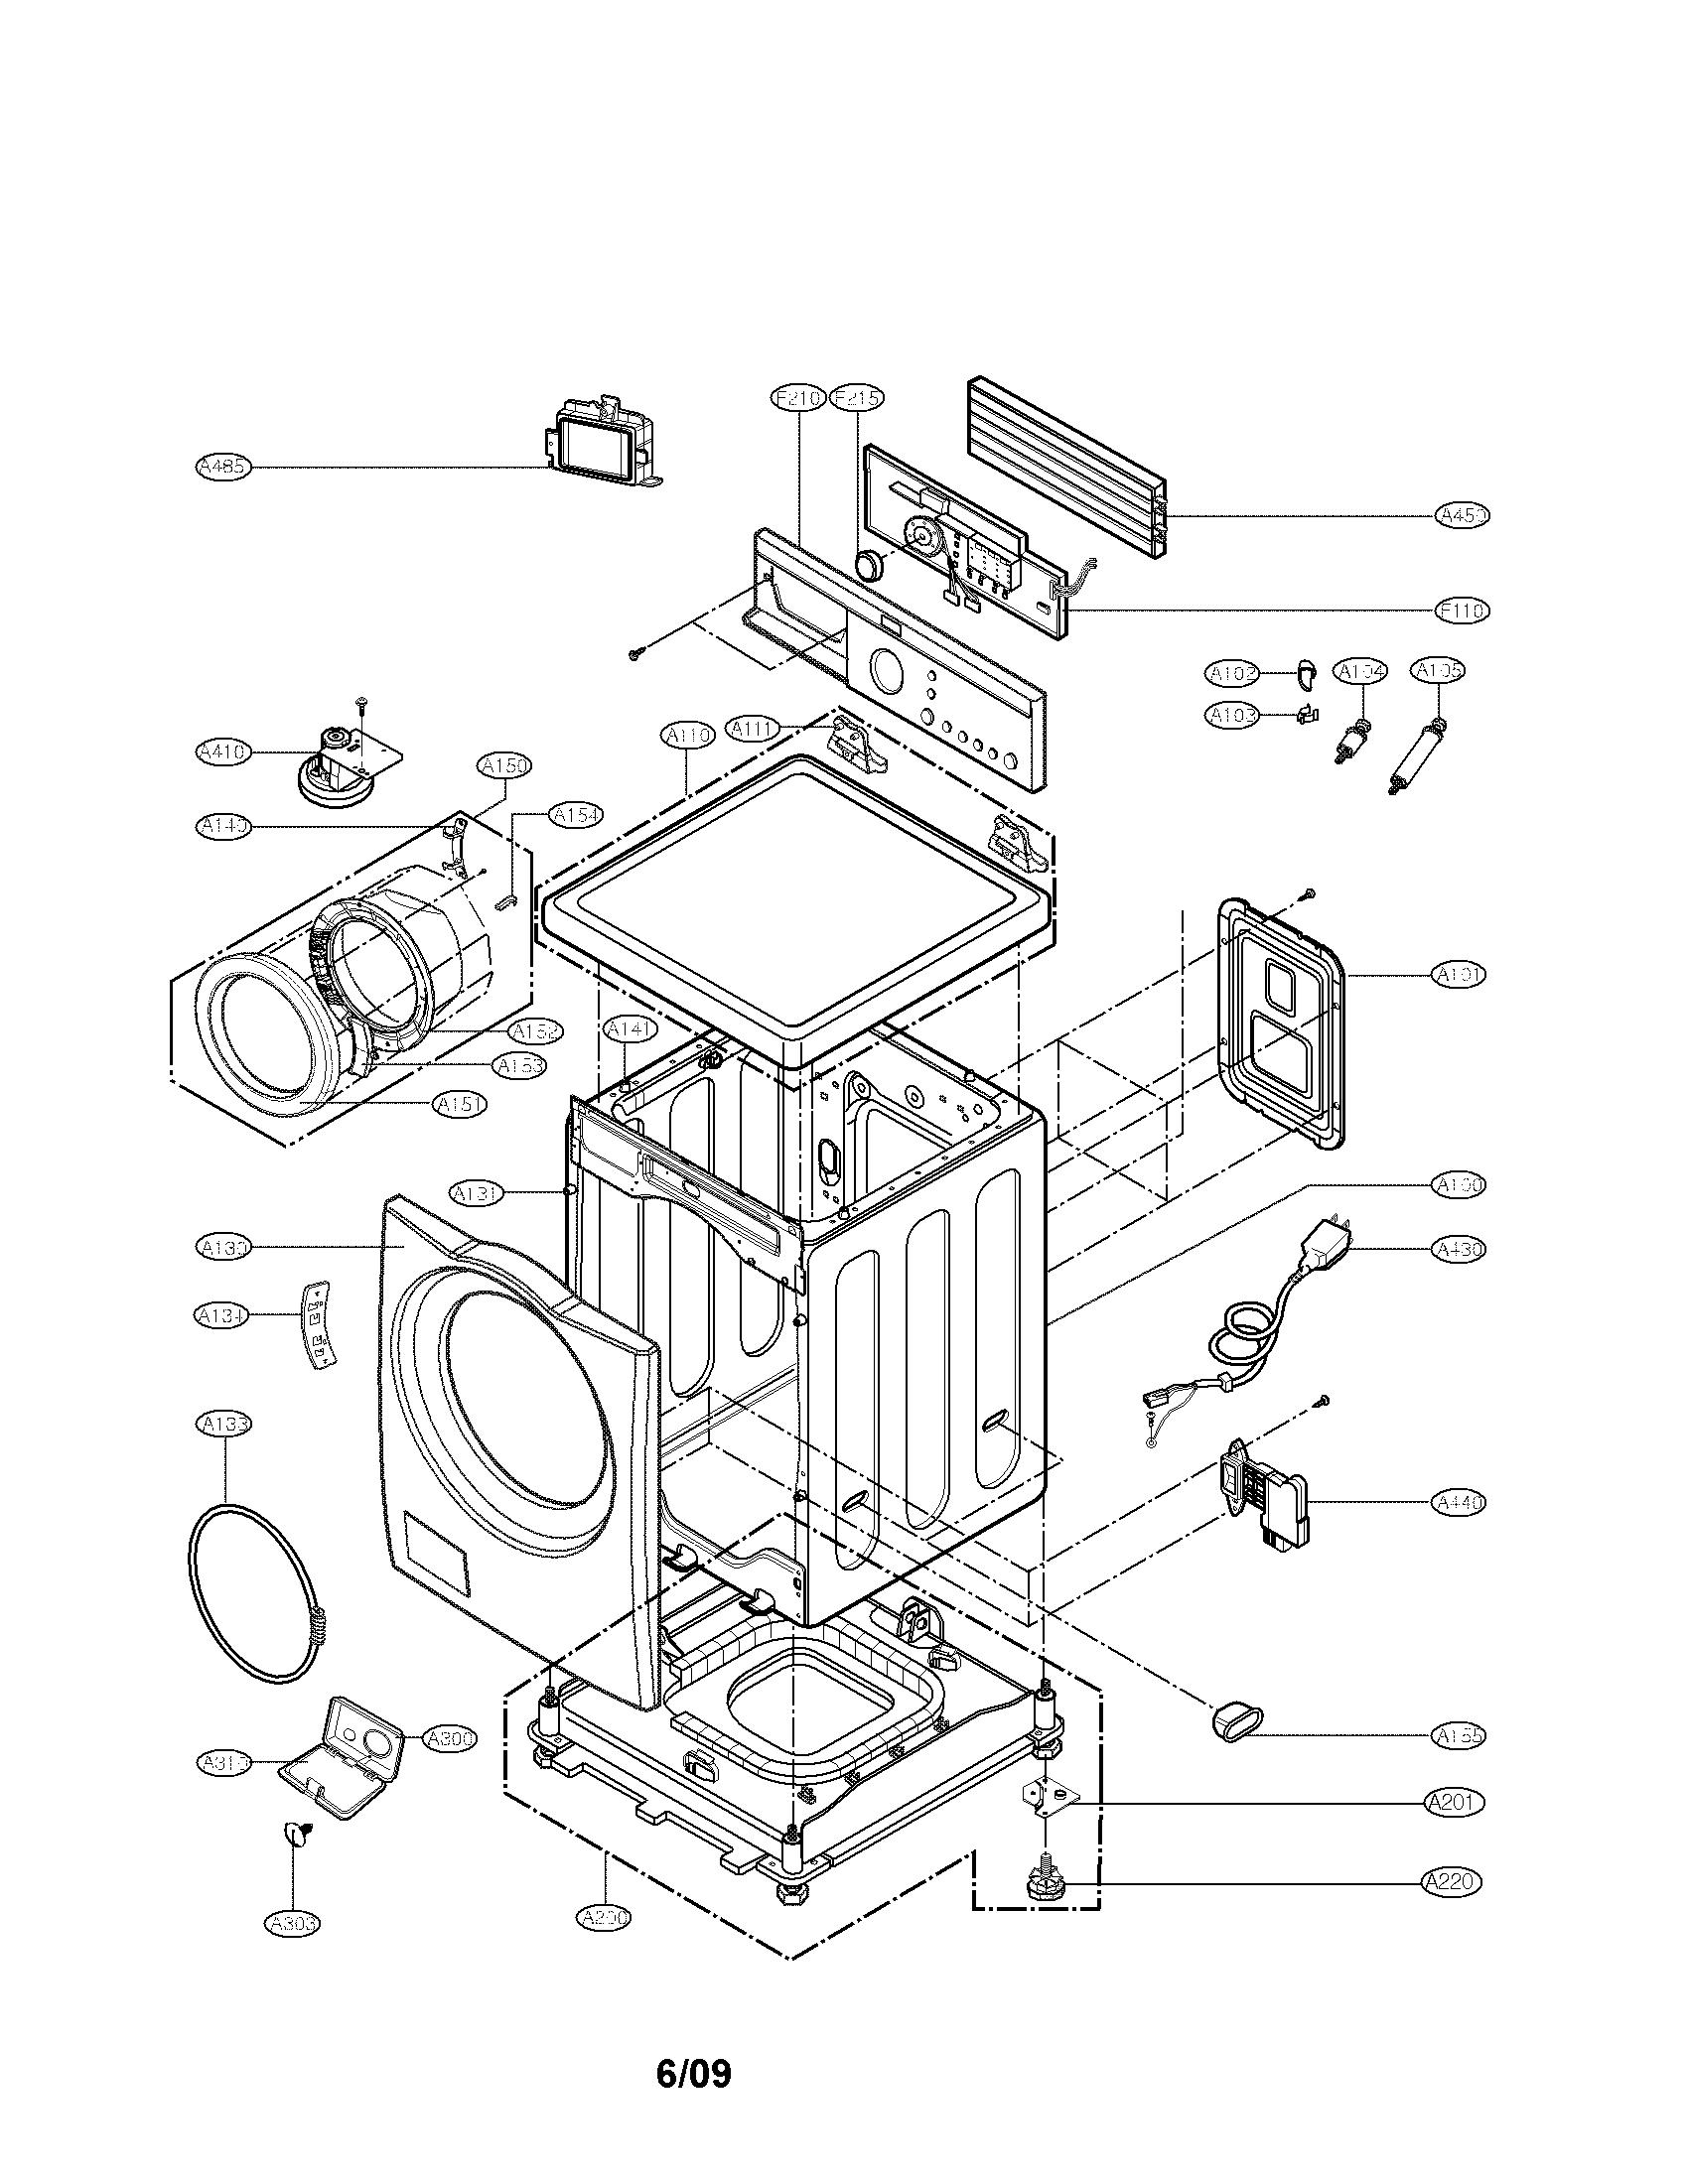 hight resolution of lg wm2010cw wiring diagram wiring diagram sheet lg washer drain pump wiring lg washer wiring